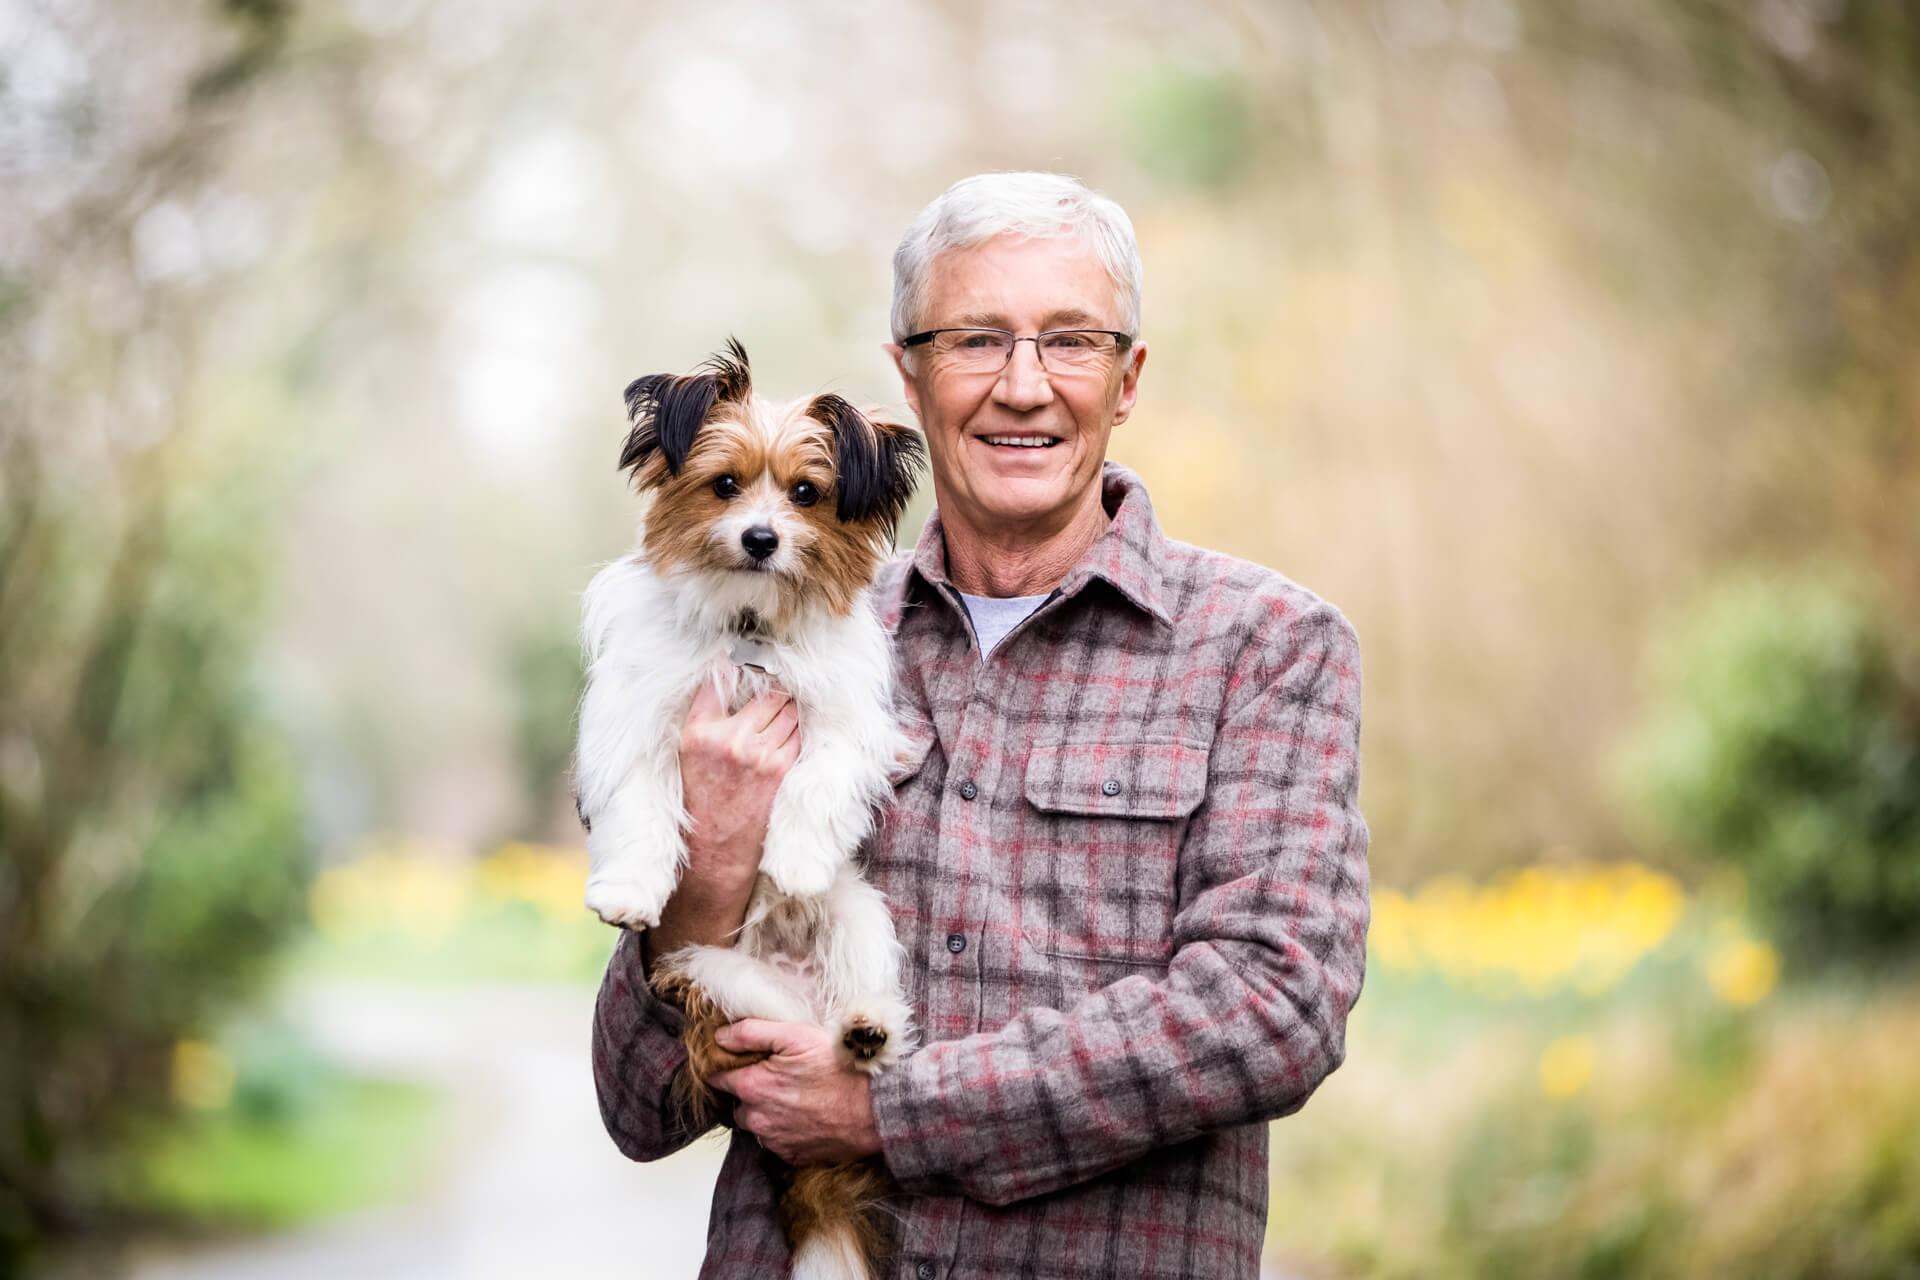 Paul o Grady holding his puppy